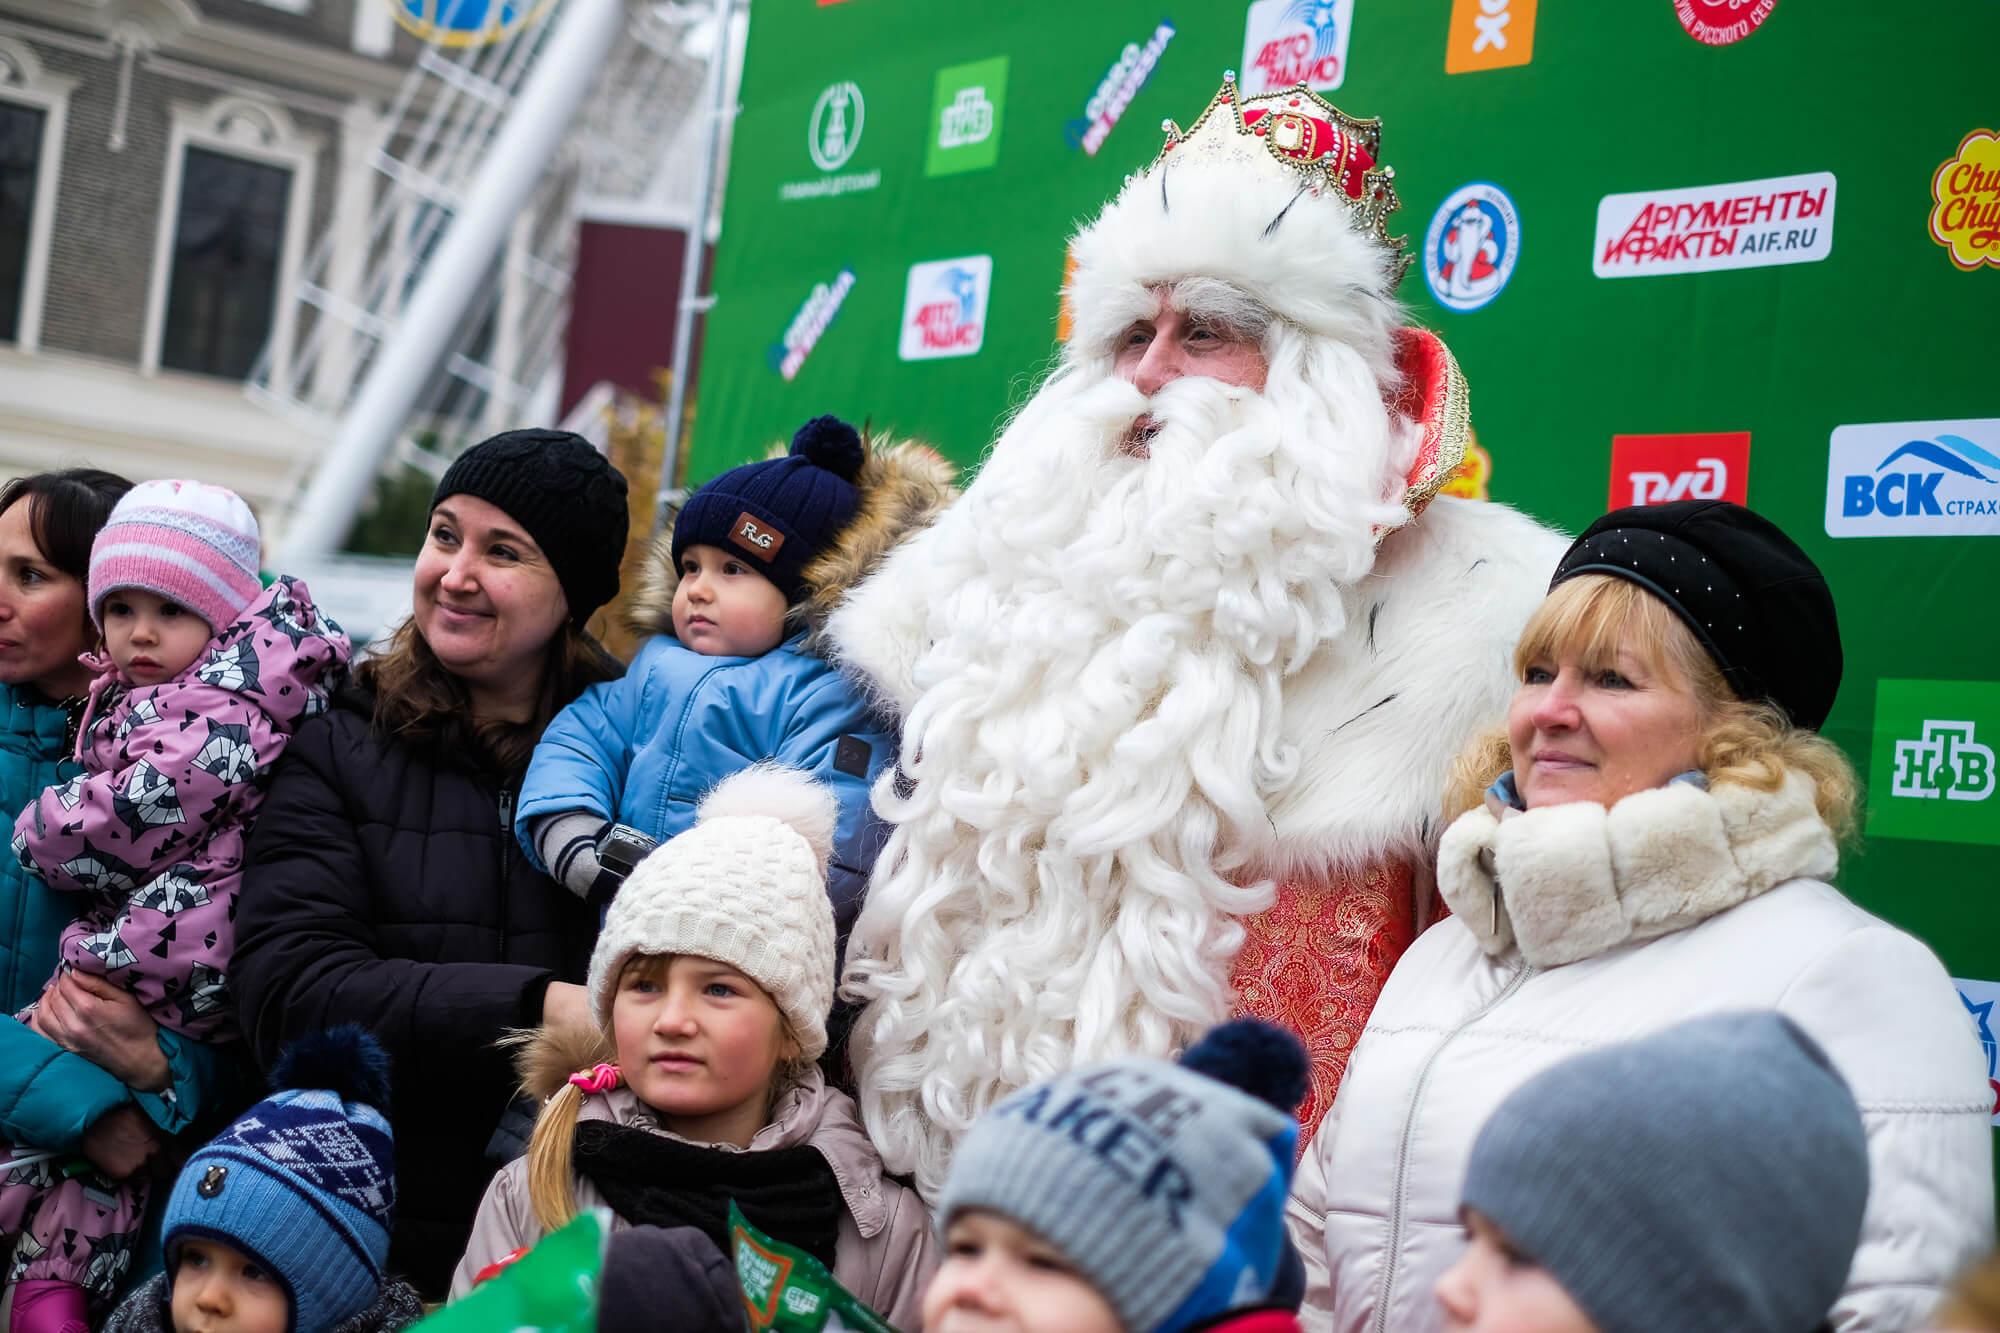 Дед Мороз из Великого Устюга посетил Краснодар